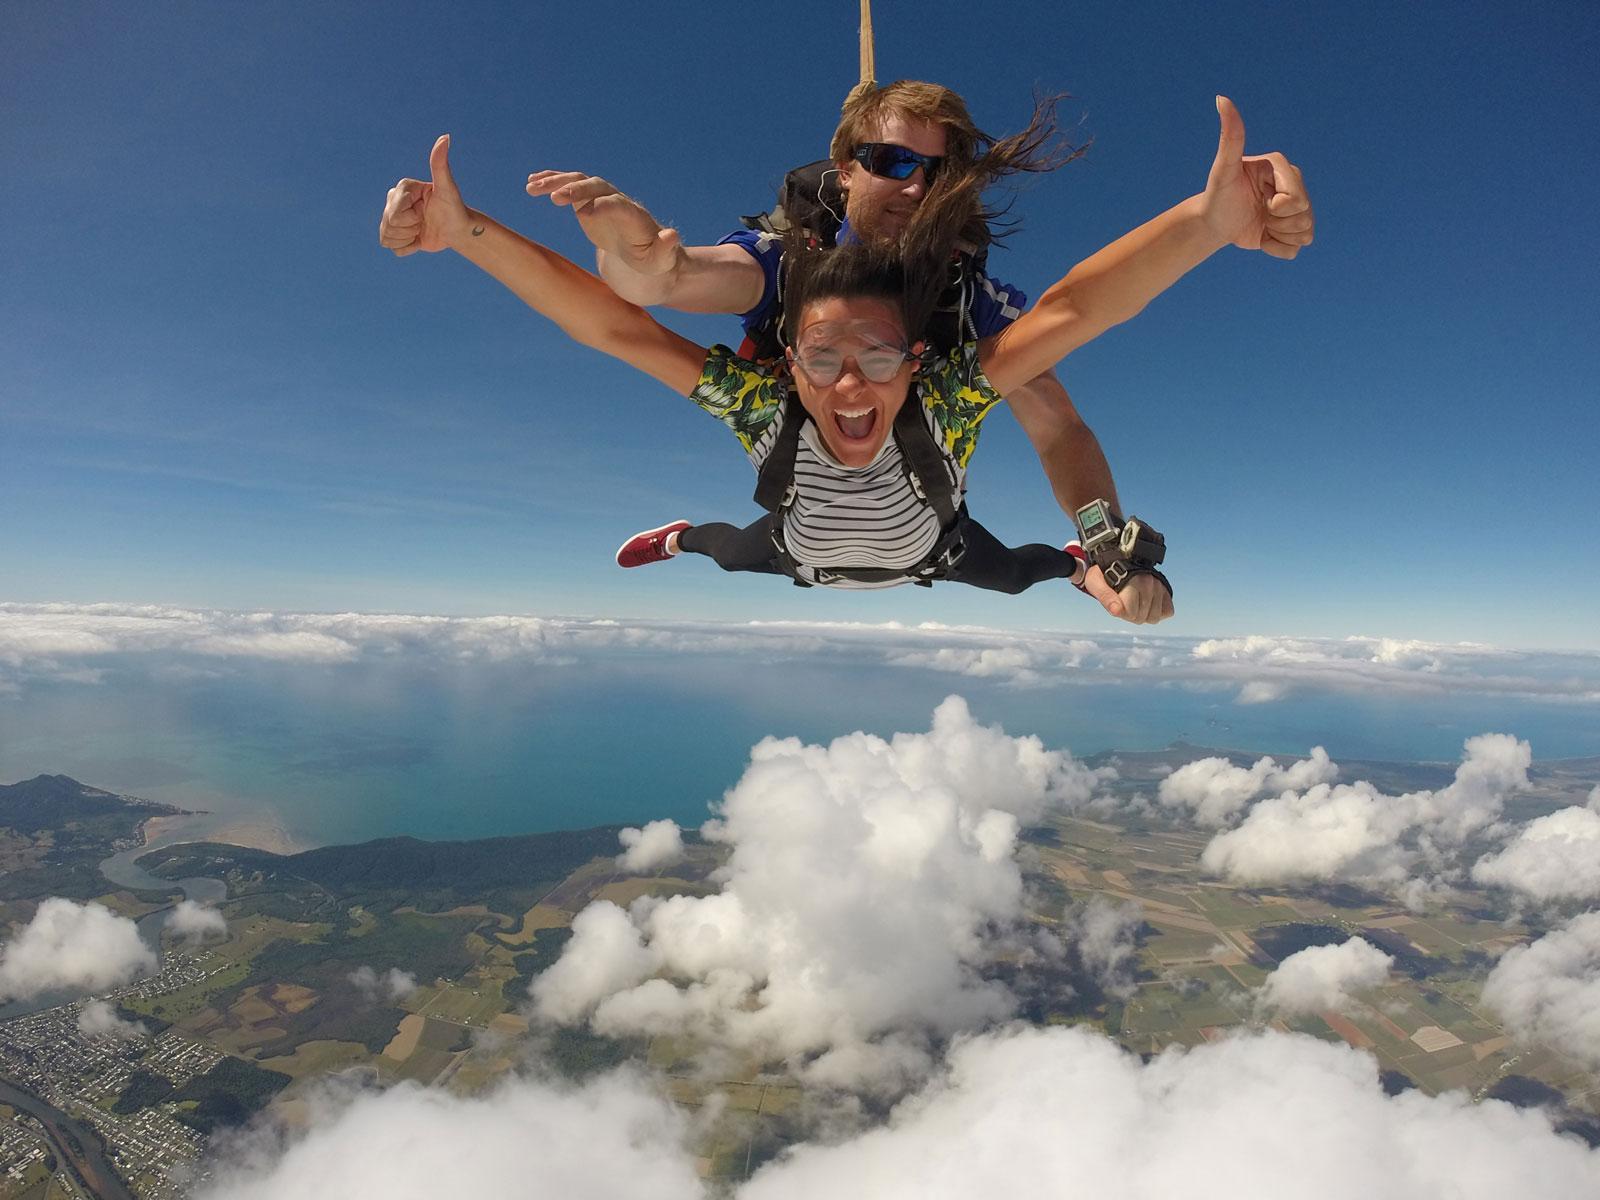 Tandem Skydive 10,000ft